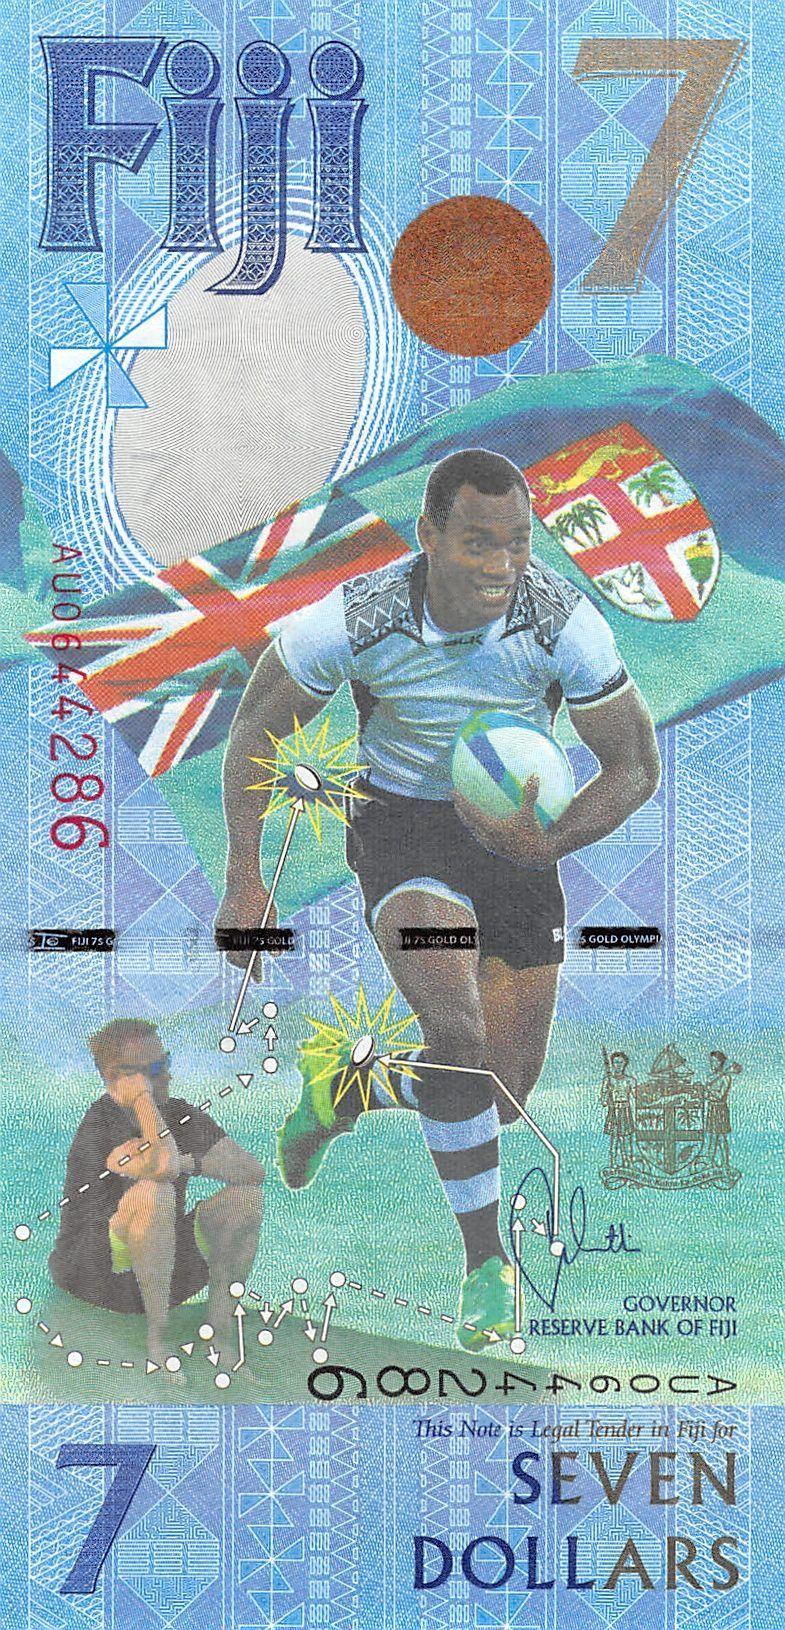 Fiji 7 dollar banknote